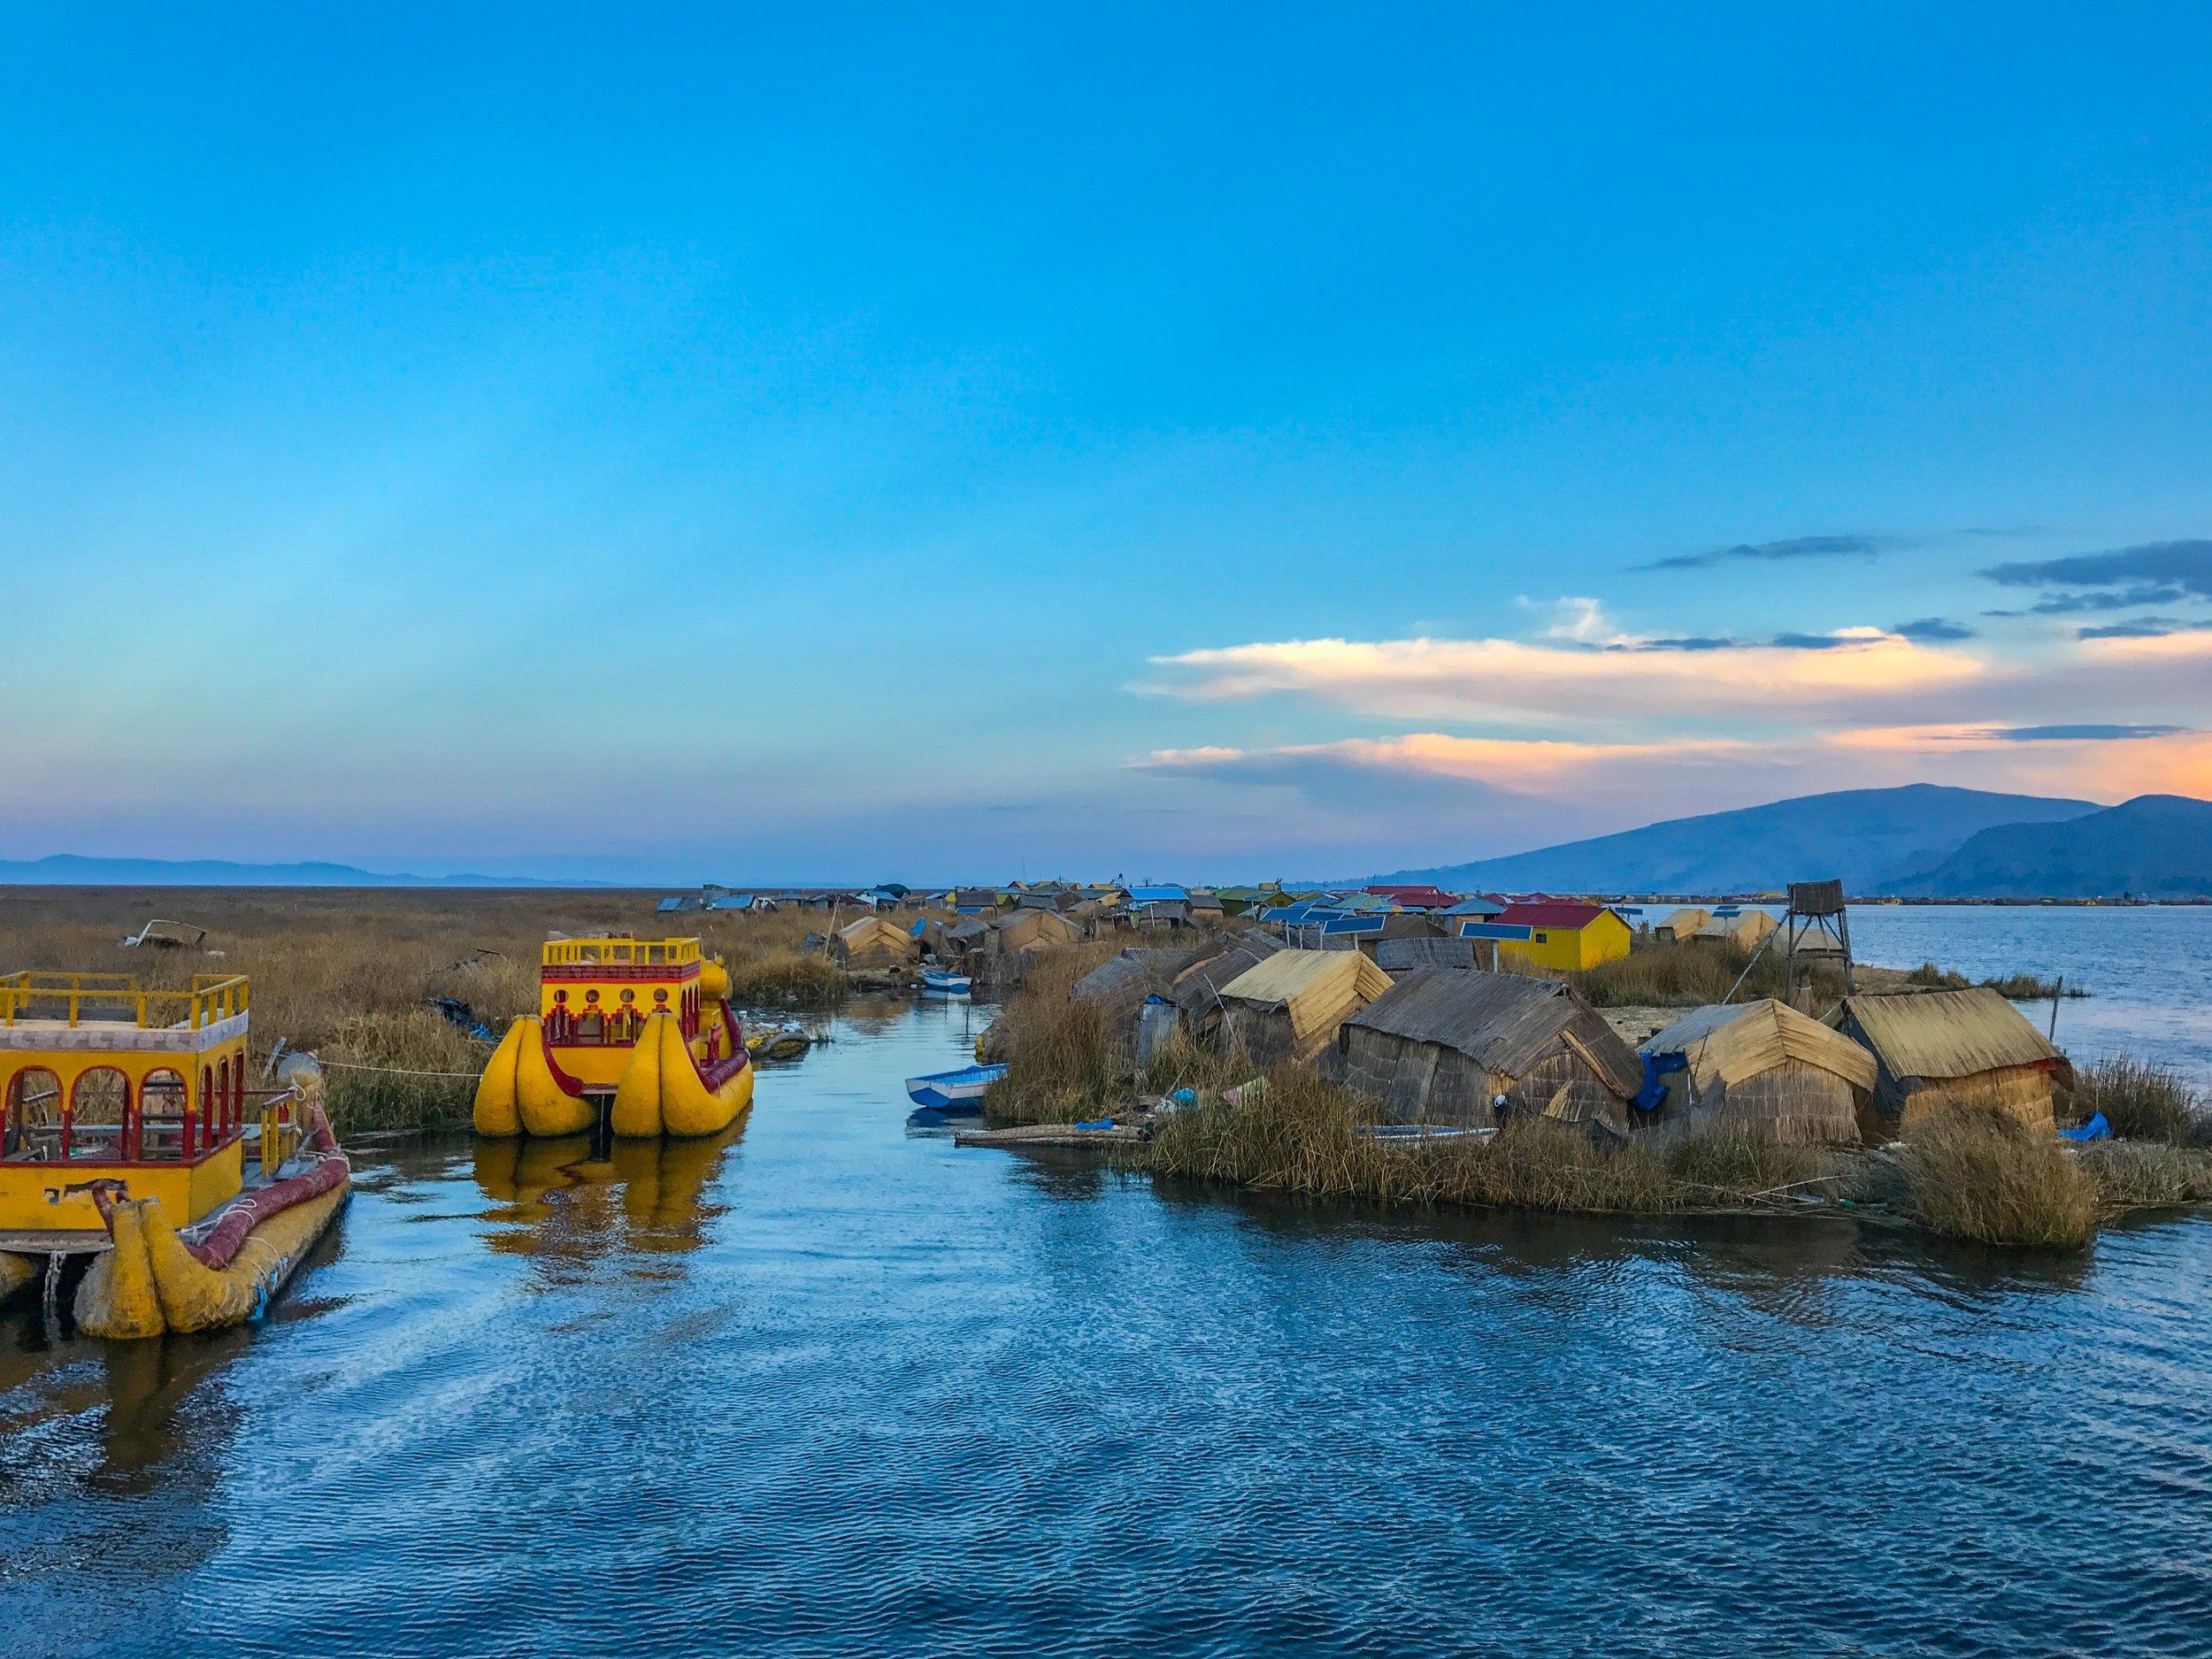 A small Uros island and its boats near Puno, Peru